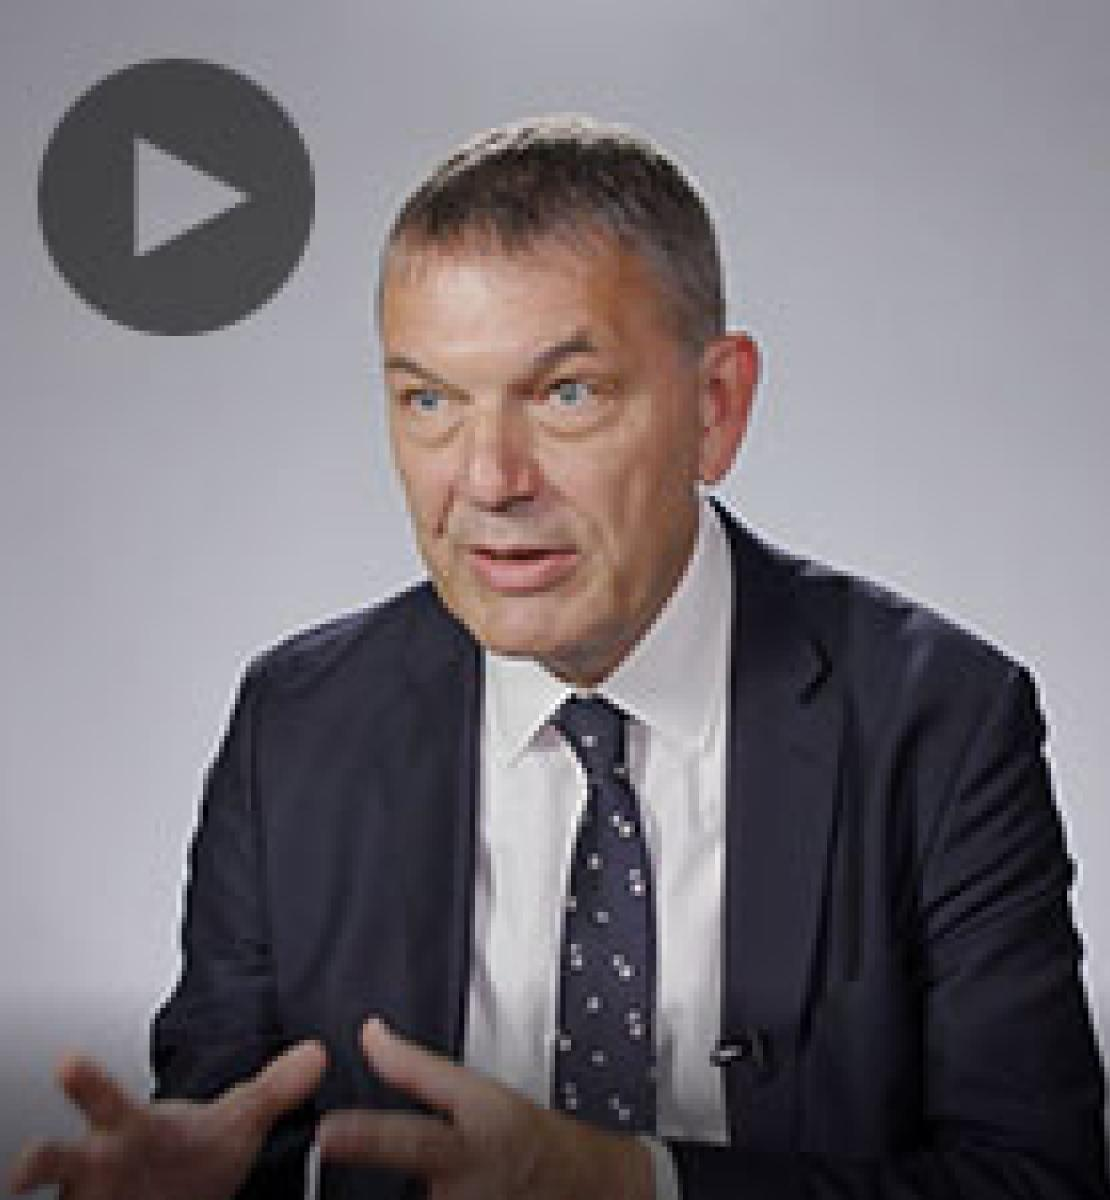 Screenshot from video message shows Resident Coordinator, Phillip Lazzarini